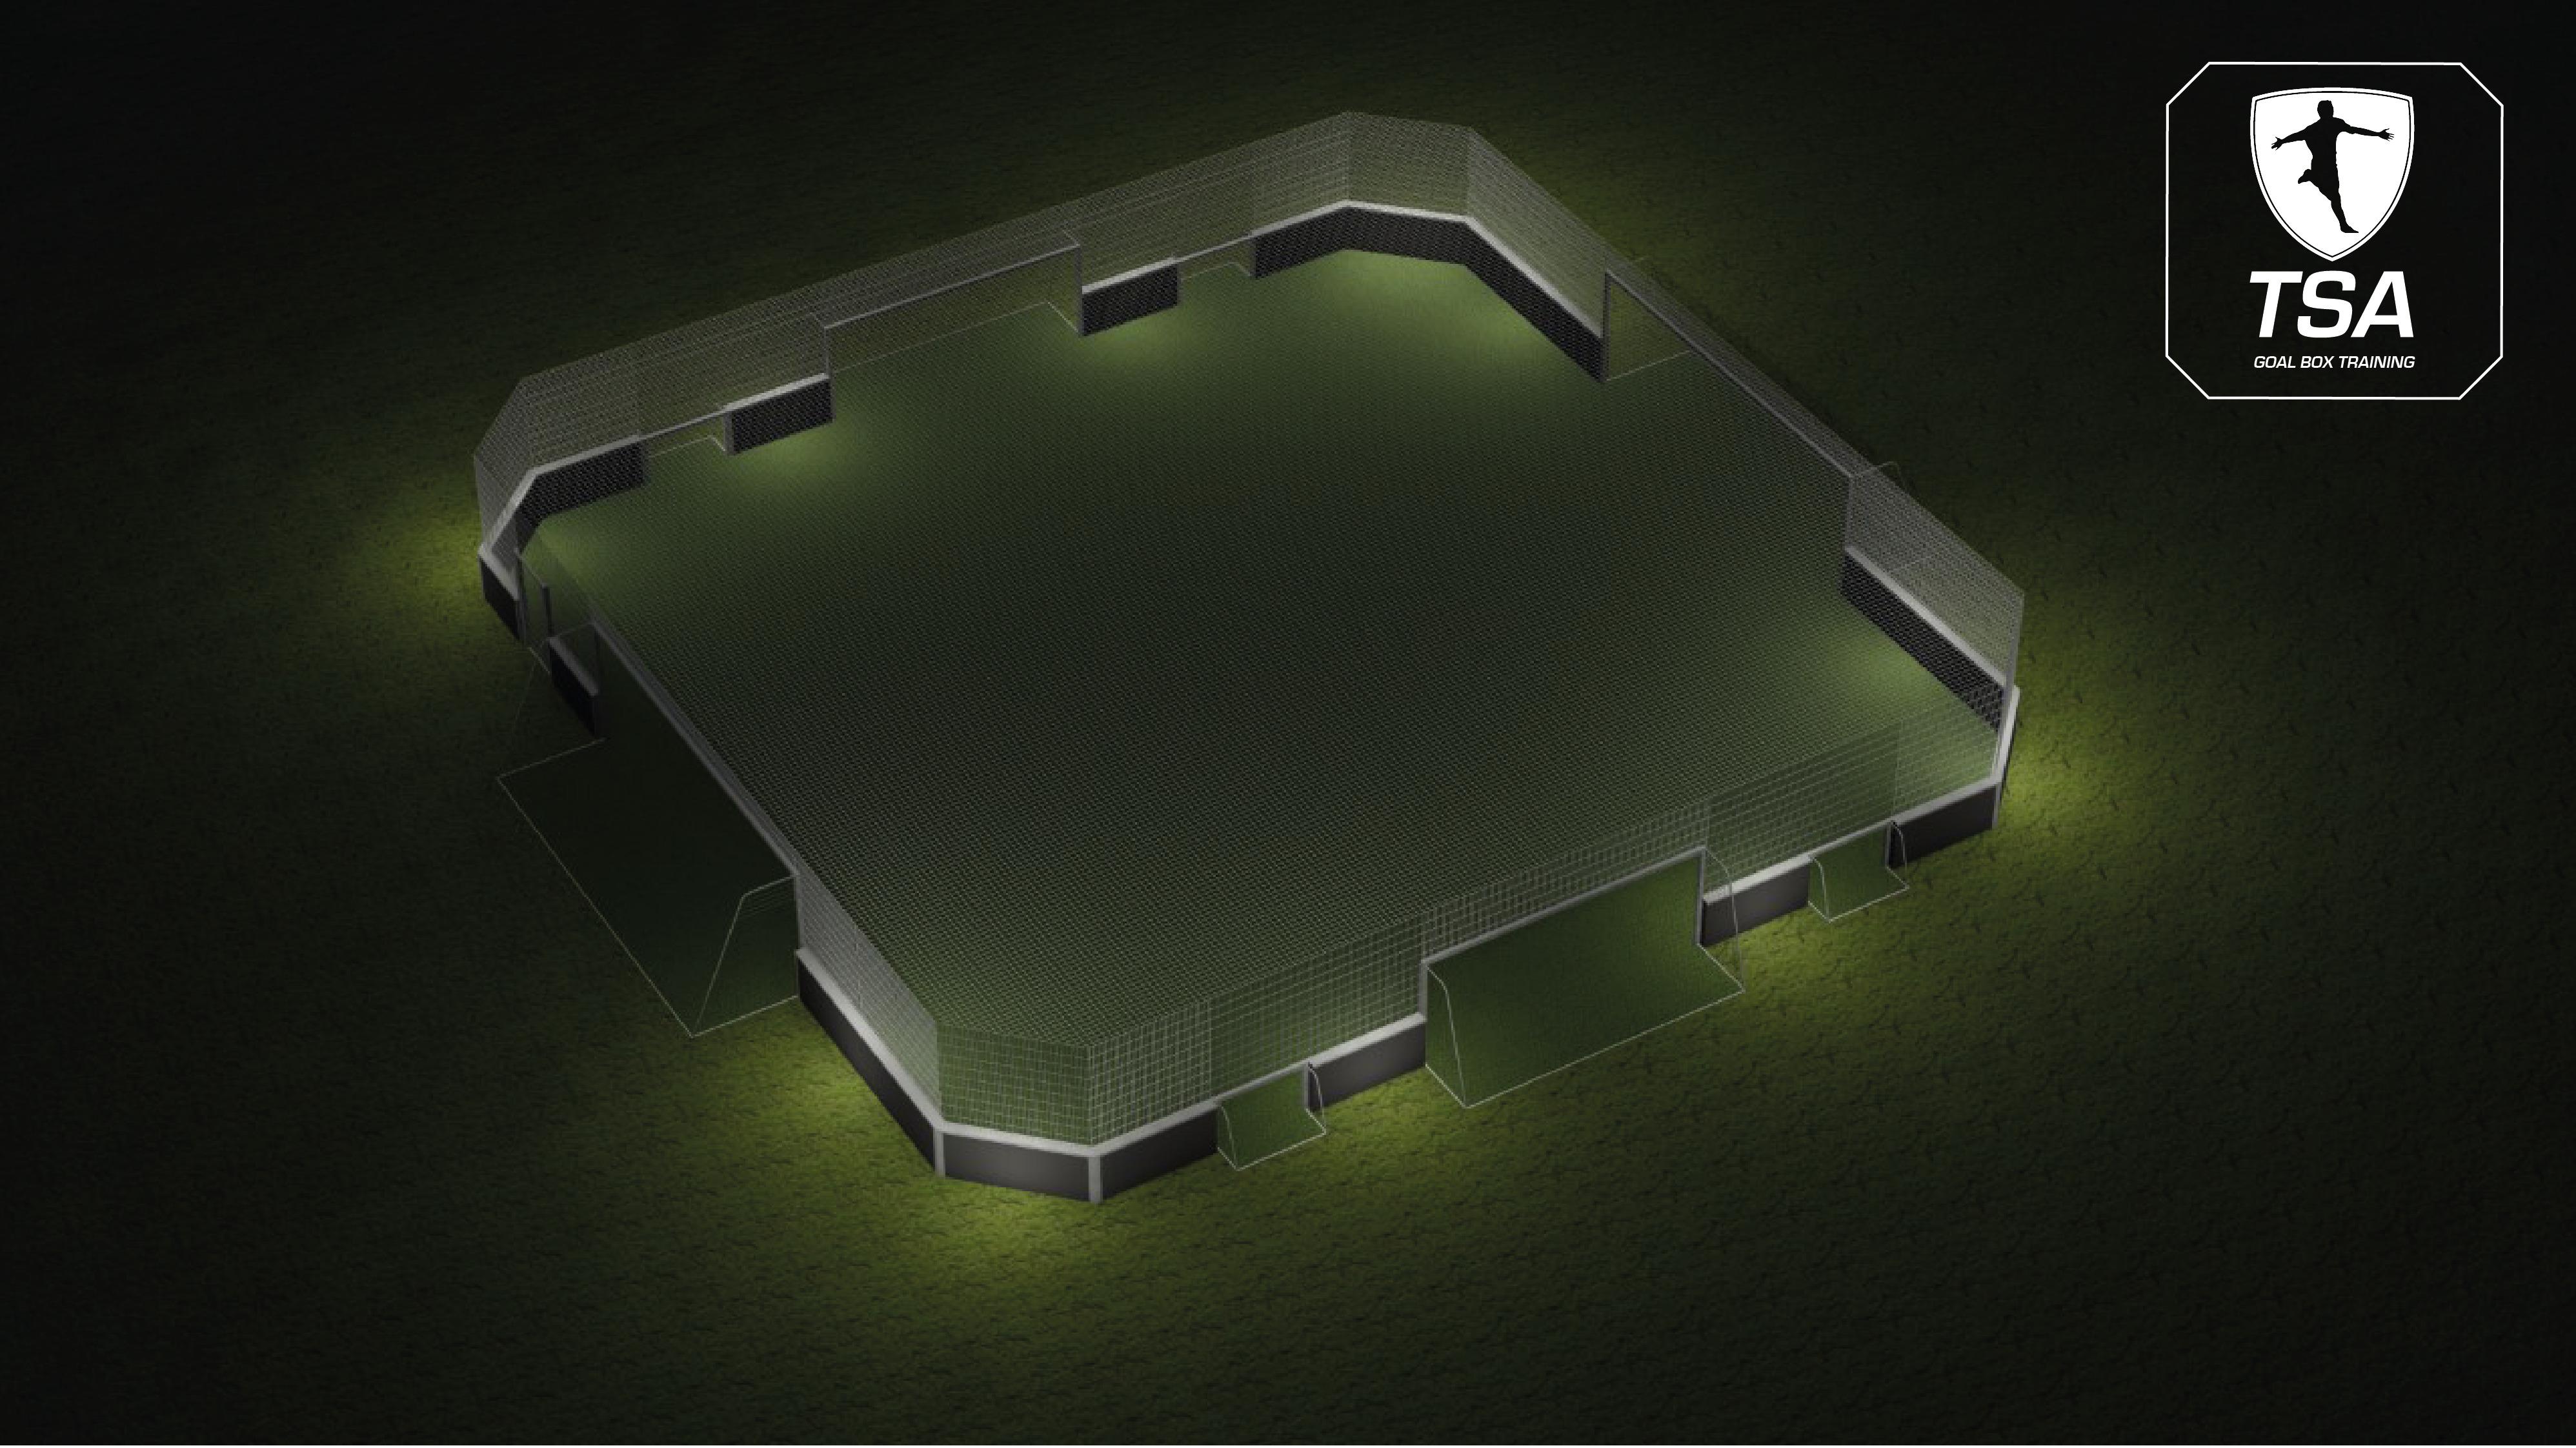 Goal_box_header-01